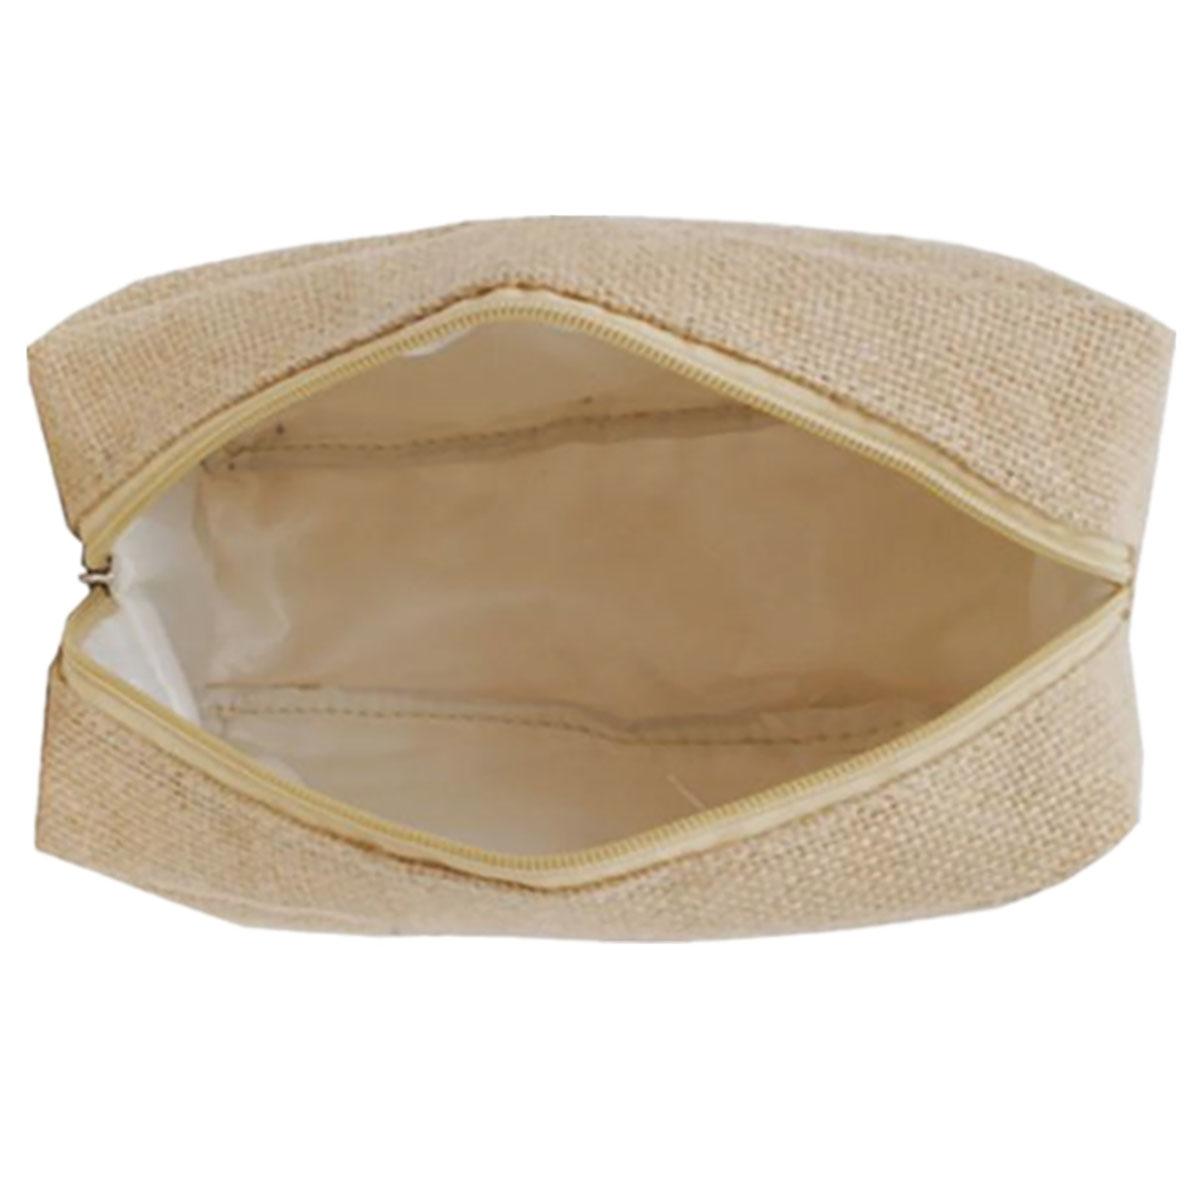 hemp bag with zipper closure